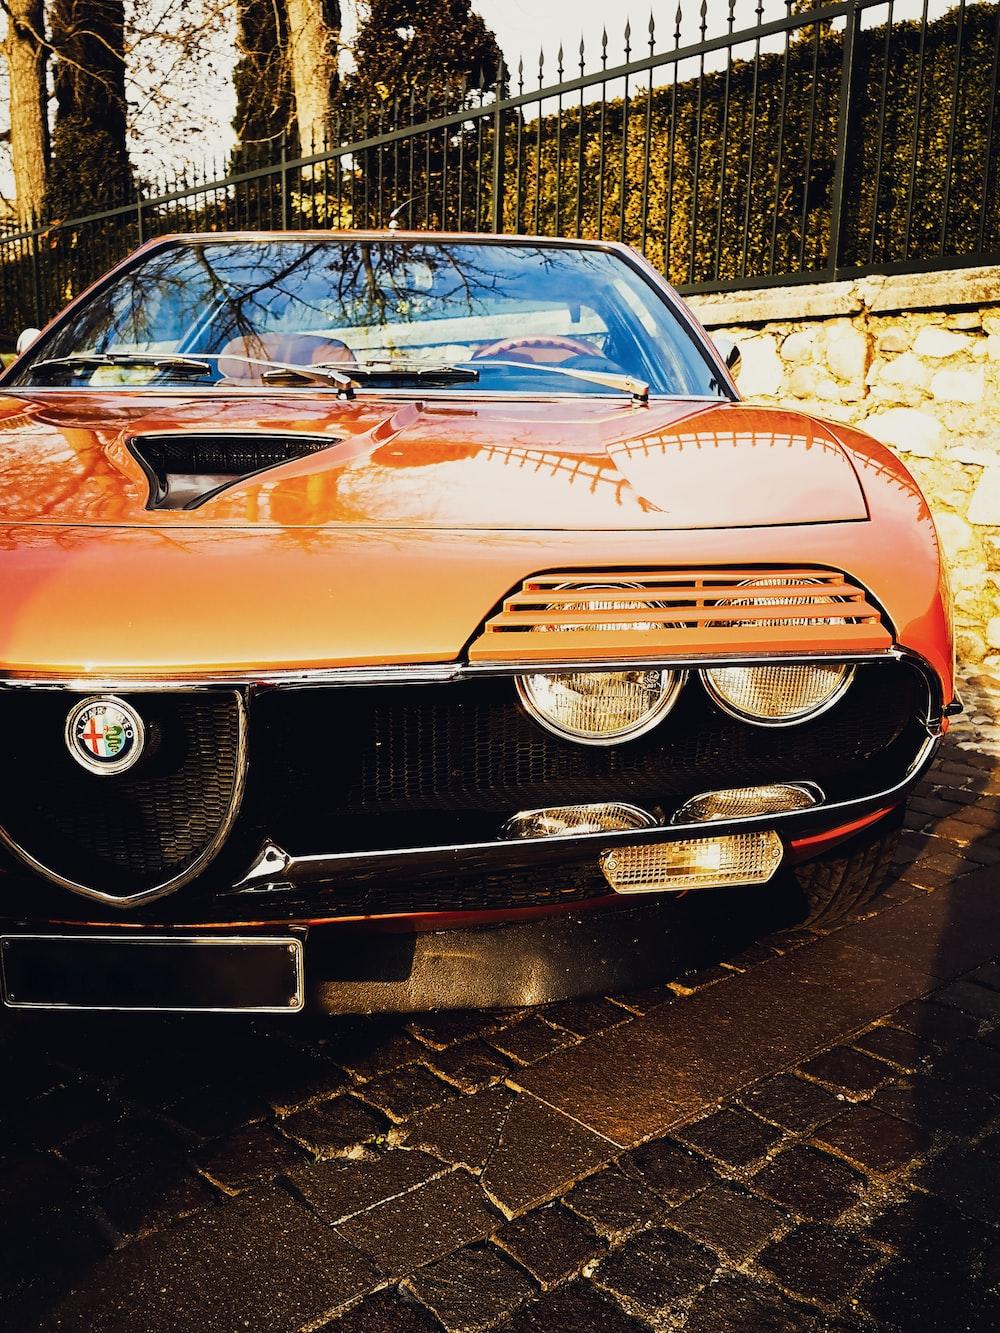 orange classic car parked beside brick wall